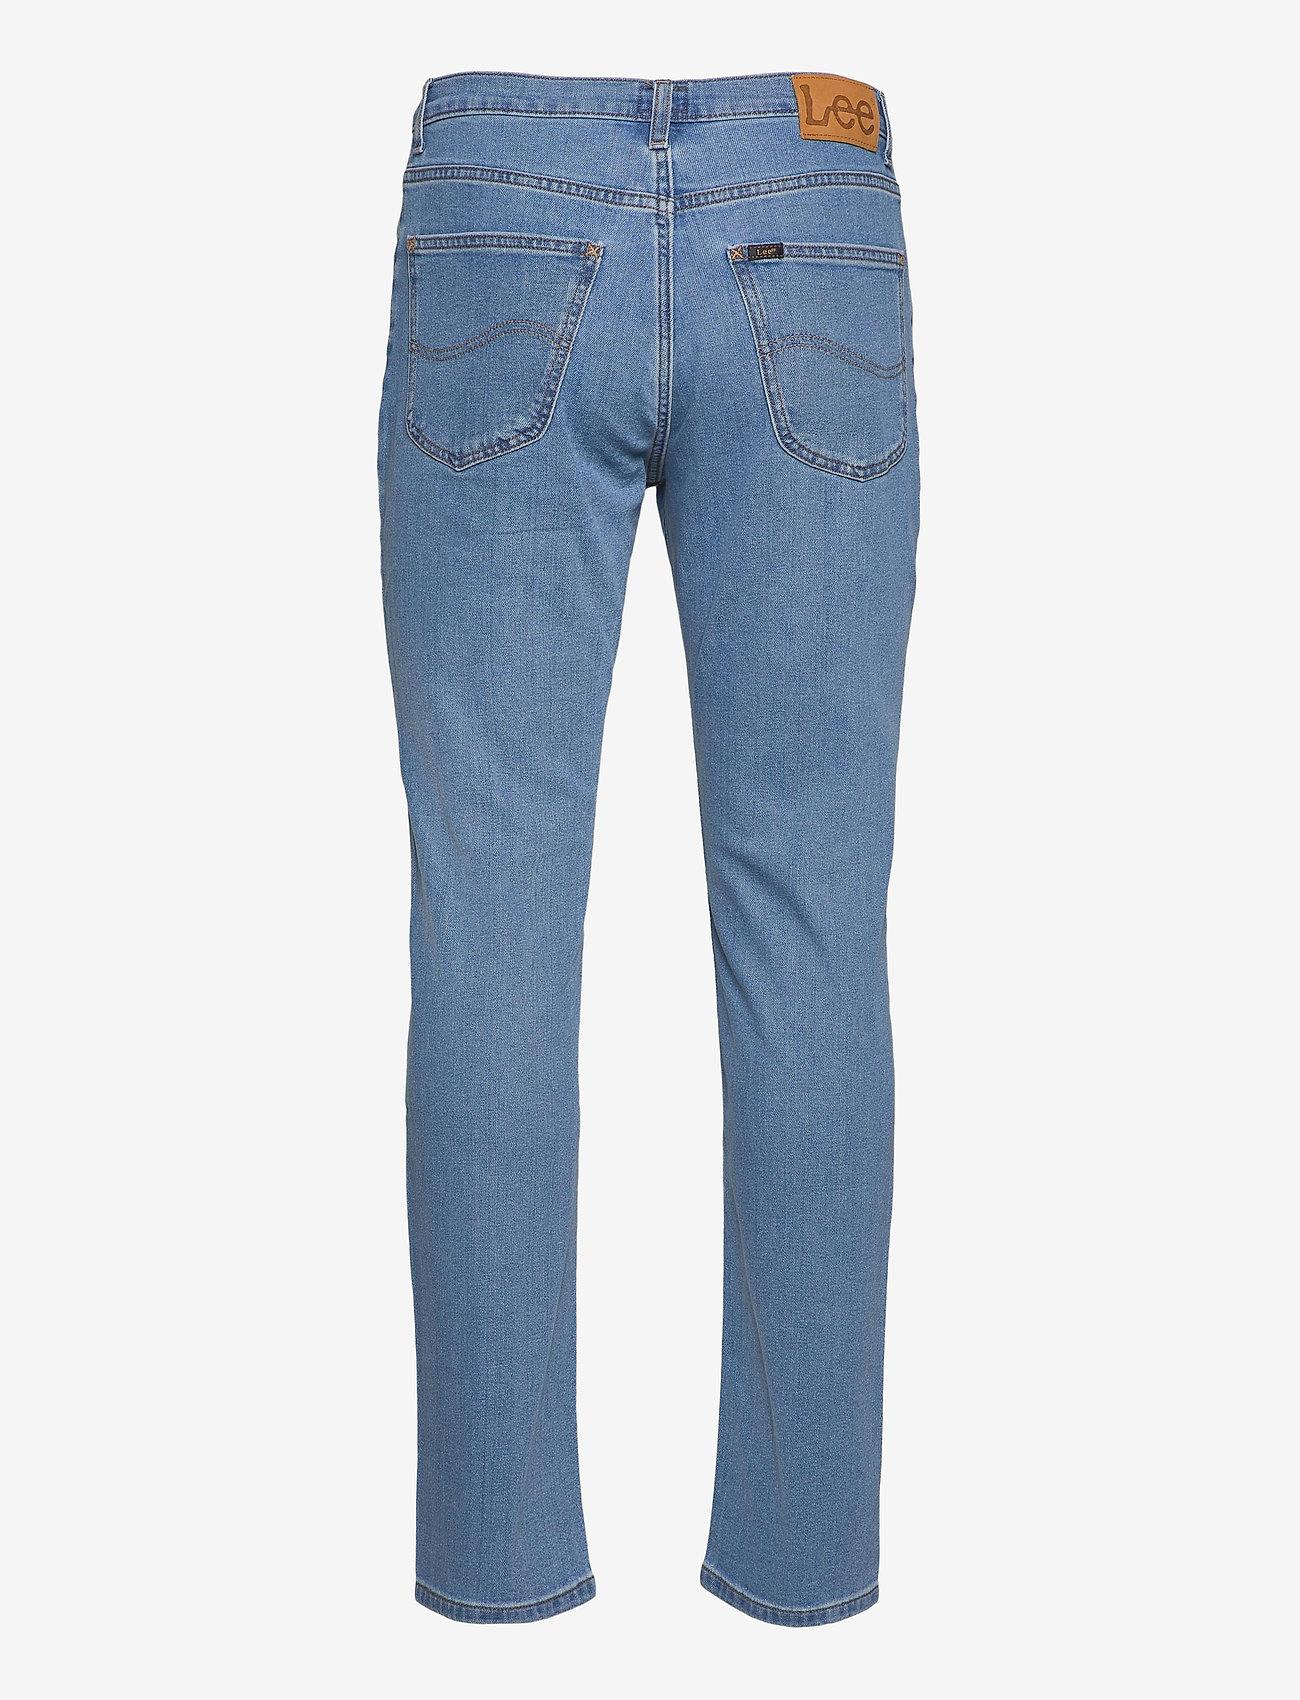 Lee Jeans - BROOKLYN STRAIGHT - regular jeans - light stone - 1